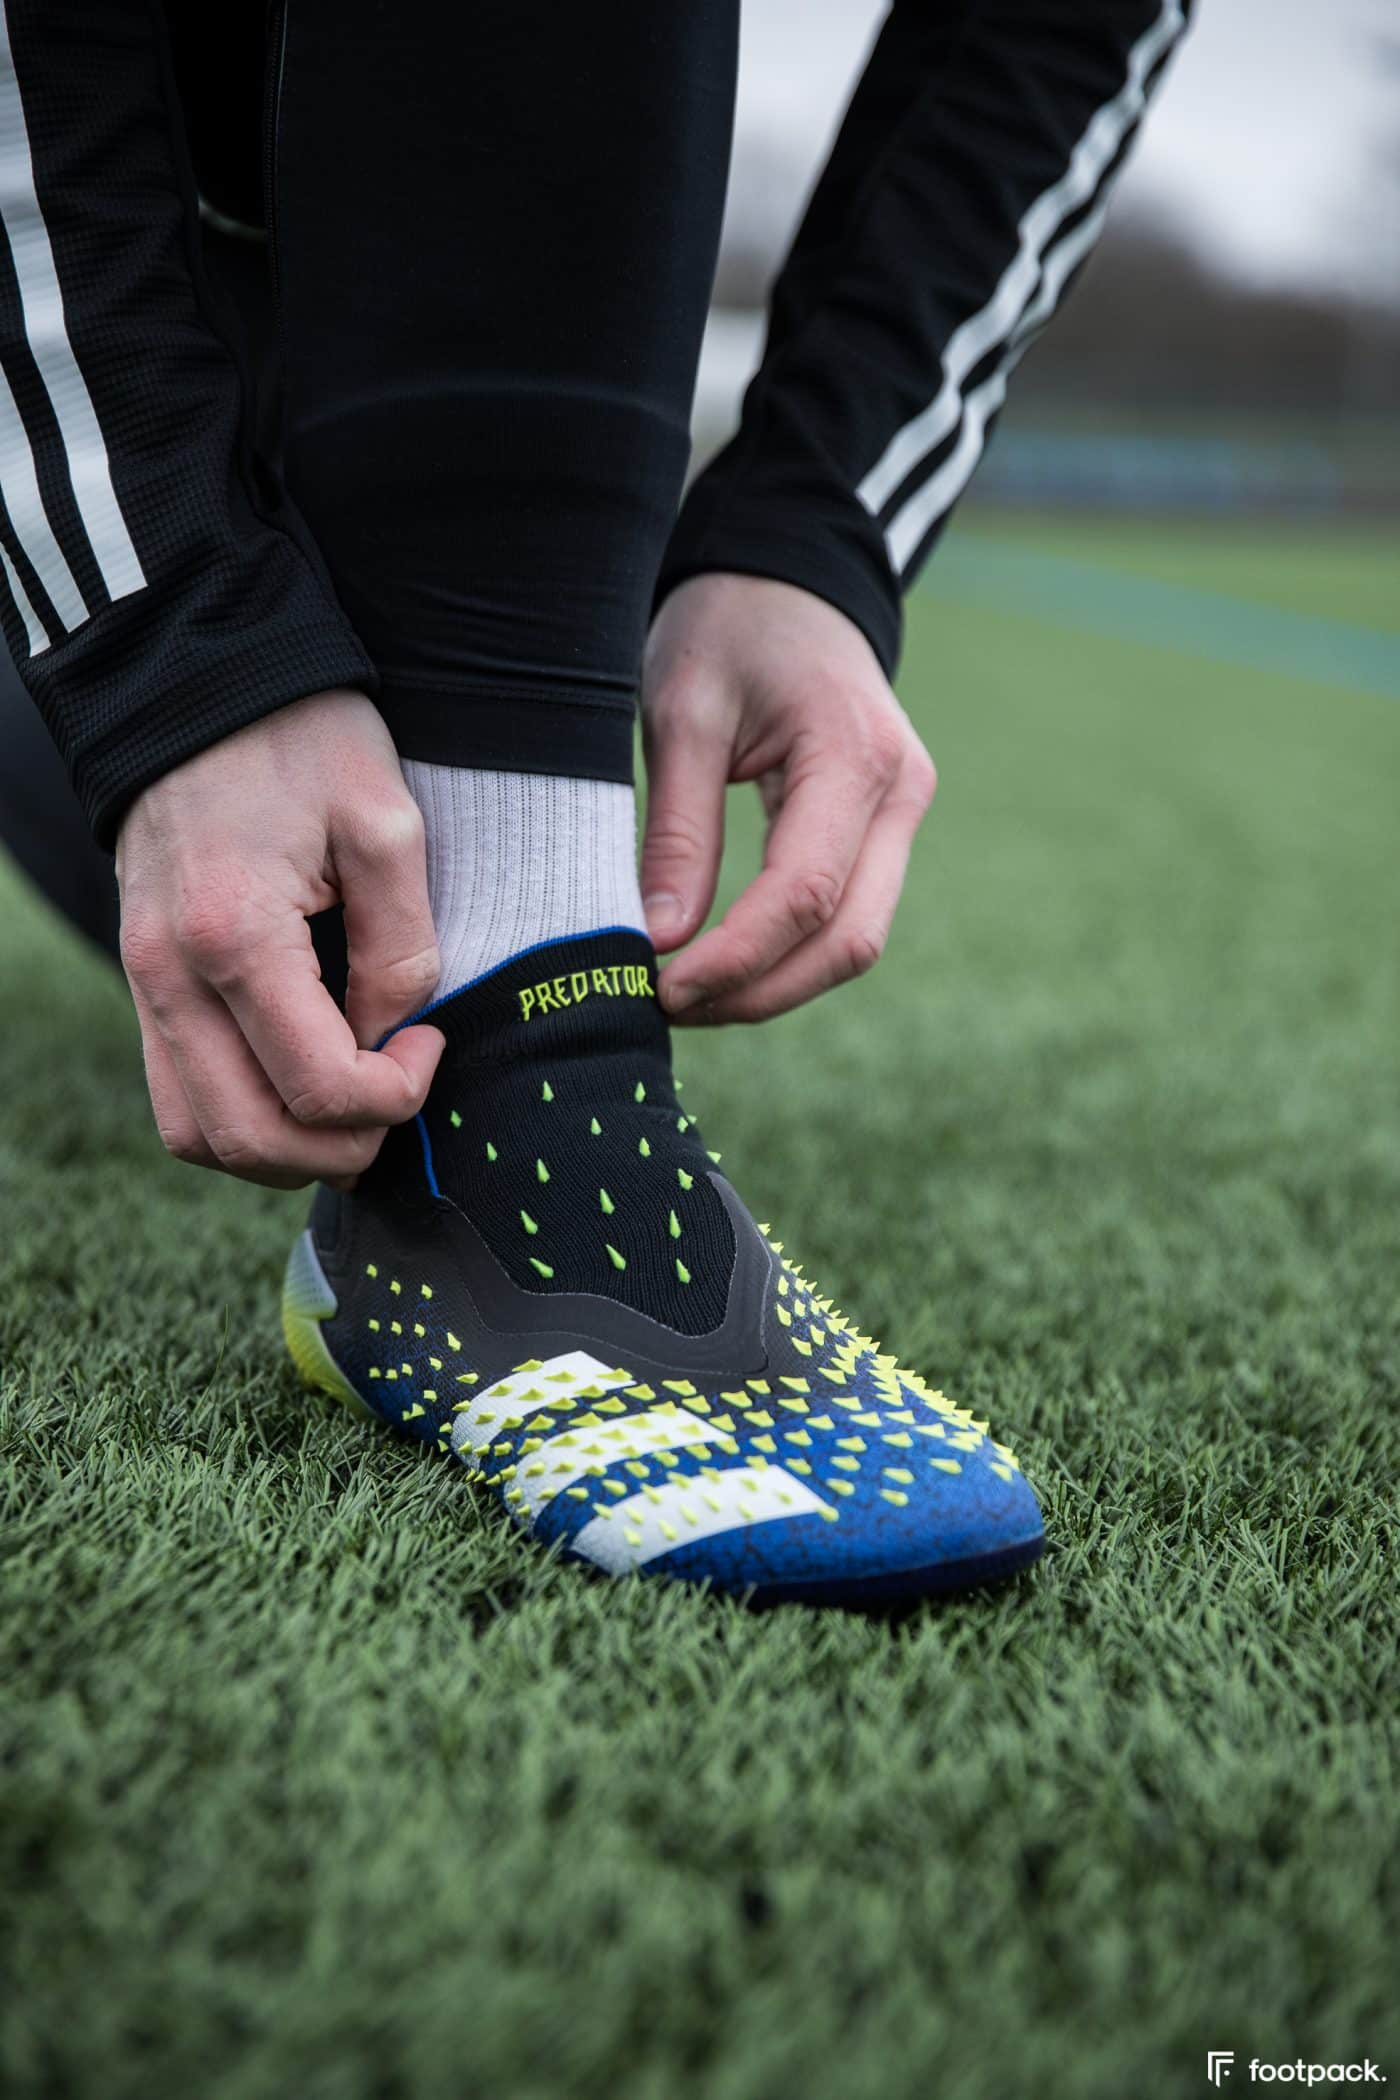 adidas-predator-freak-superlative-footpack-21